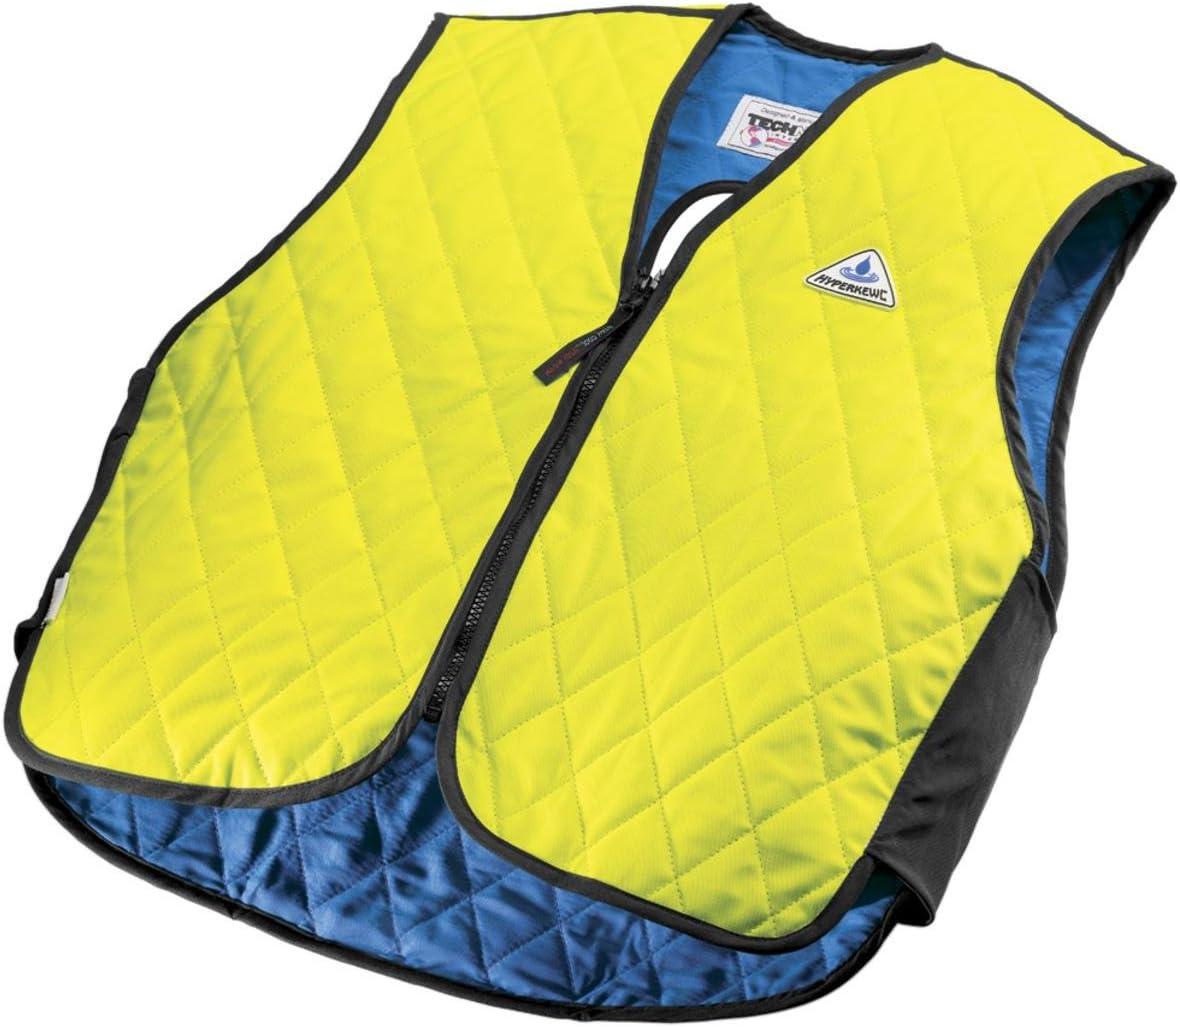 TECHNICHE INTERNATIONAL 6529-HV-SH-2XL Hyperkewl Evaporative Cooling Fall Prevention Vest, Hi-Viz Lime, XX-Large, 10 Per Case